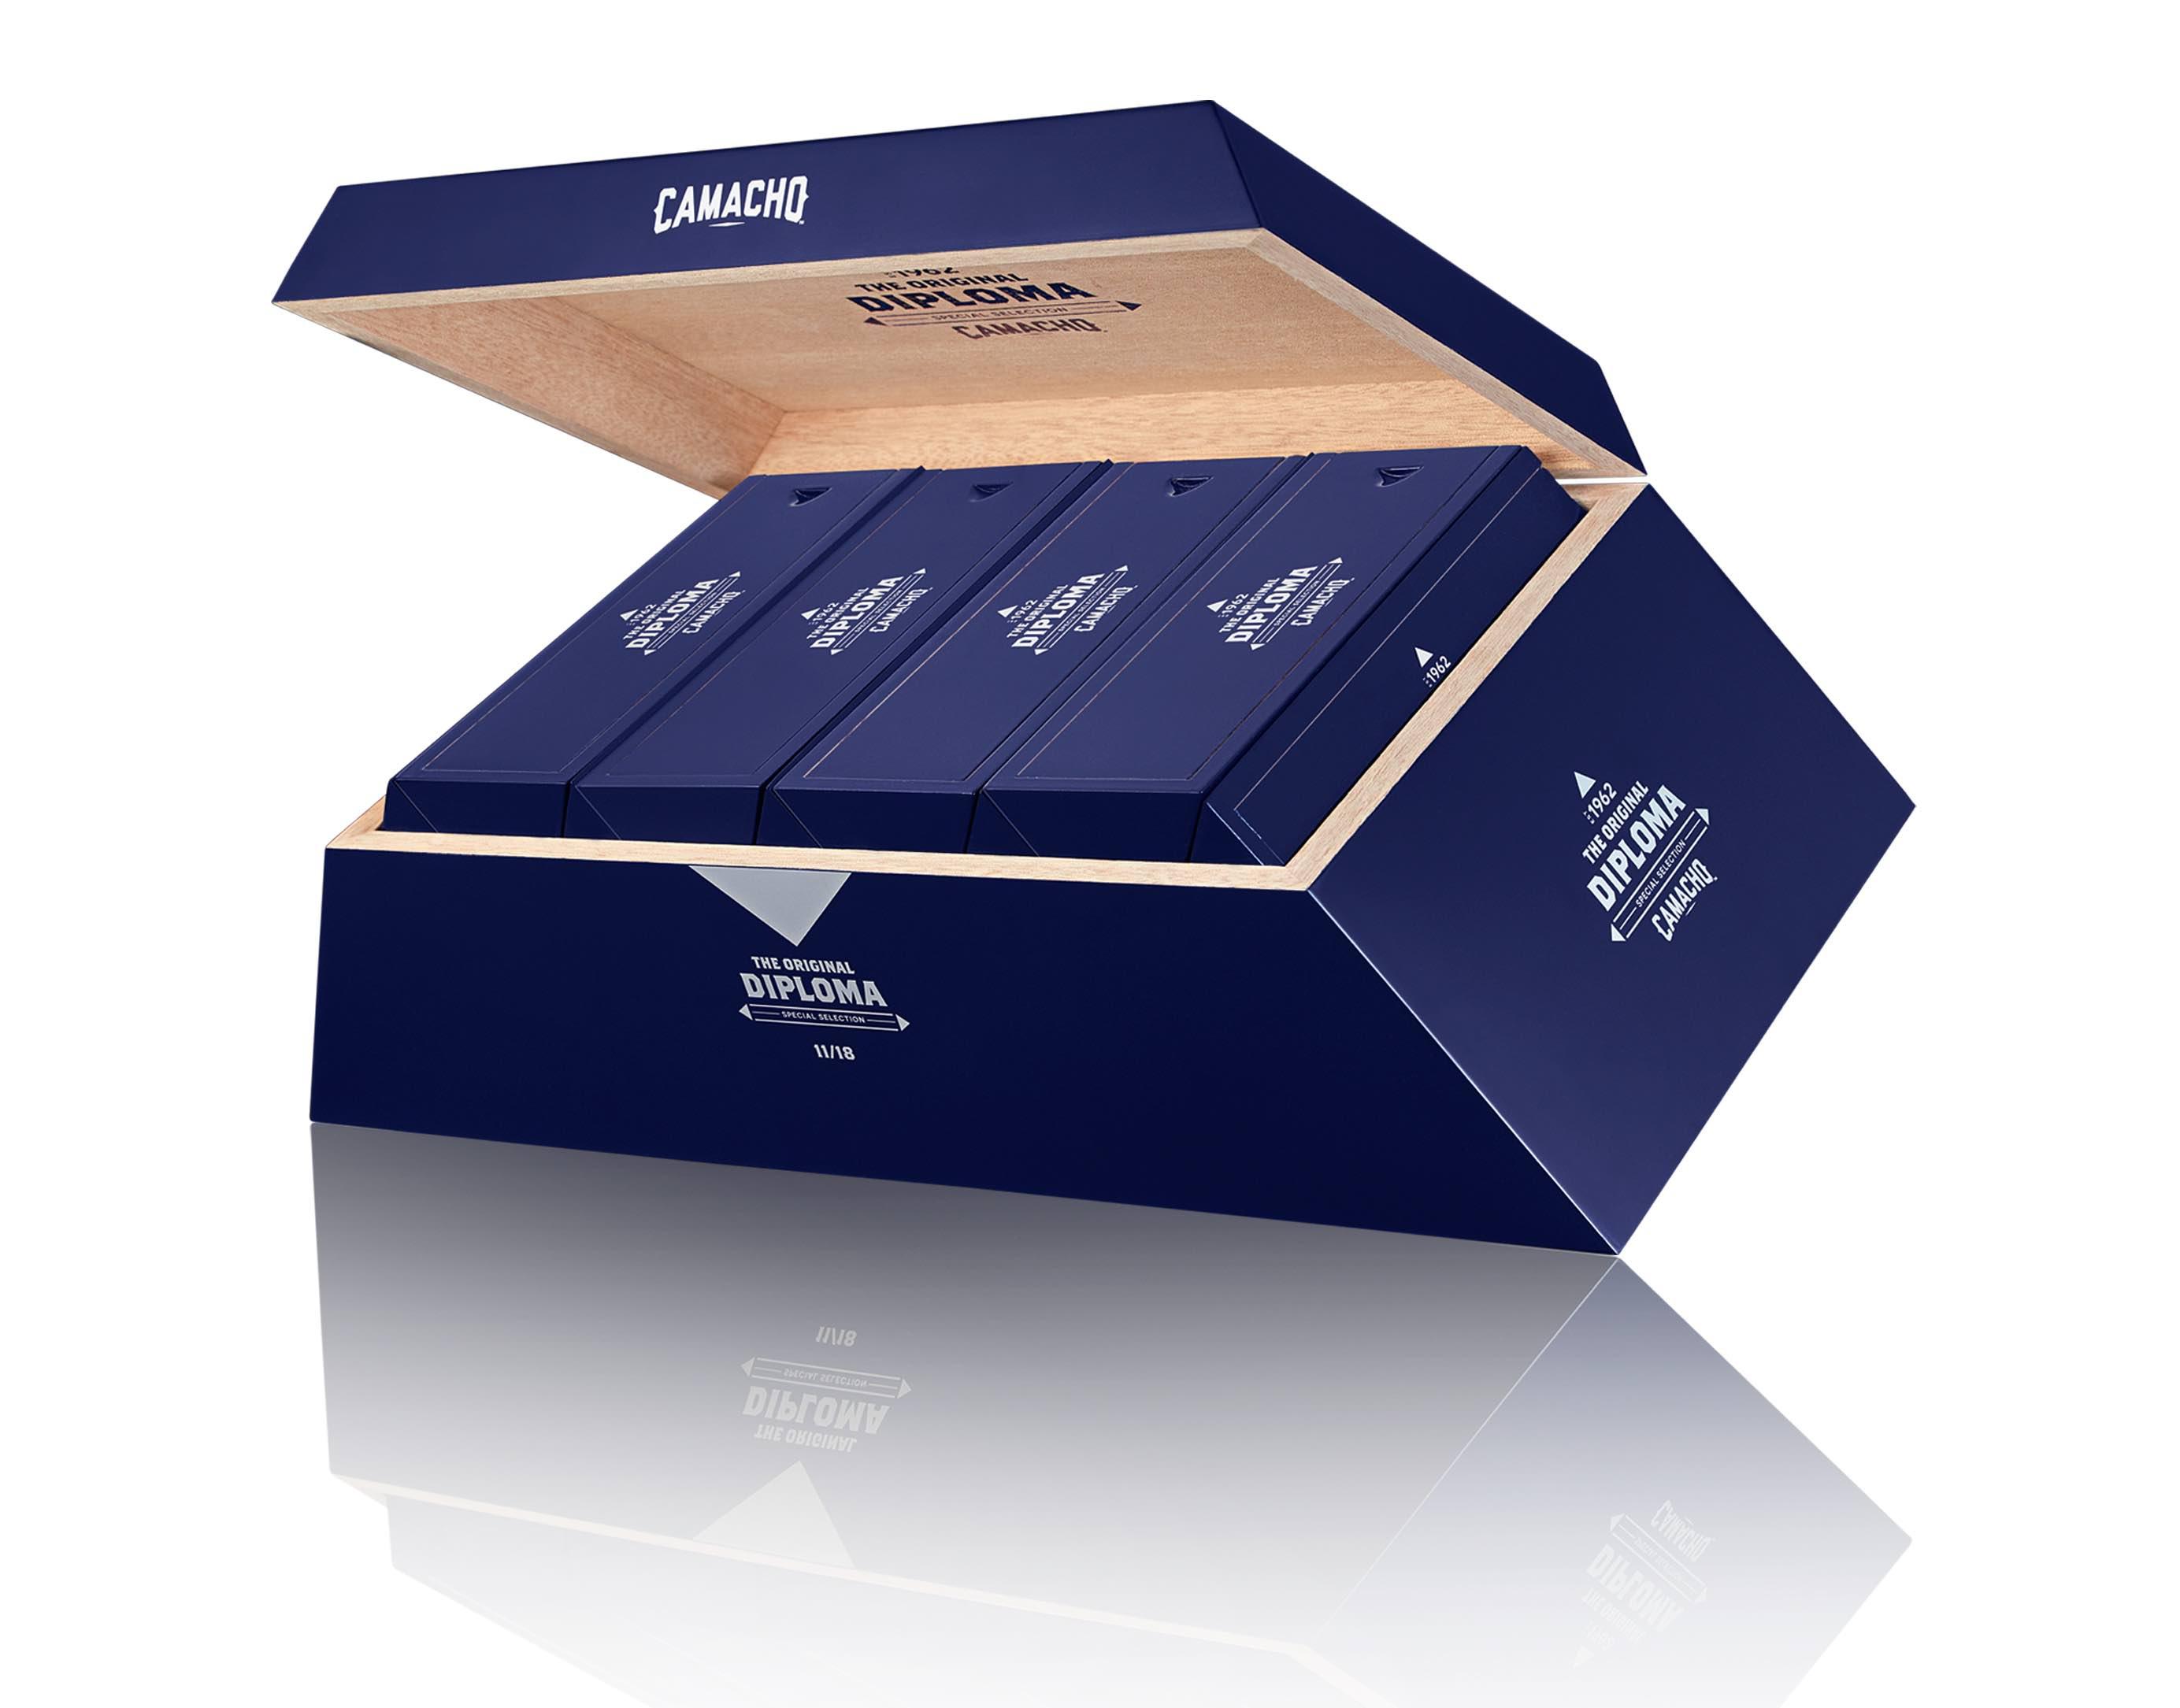 Cigar News: Camacho Diploma Special Selection 11/18 Set to Hit Stores